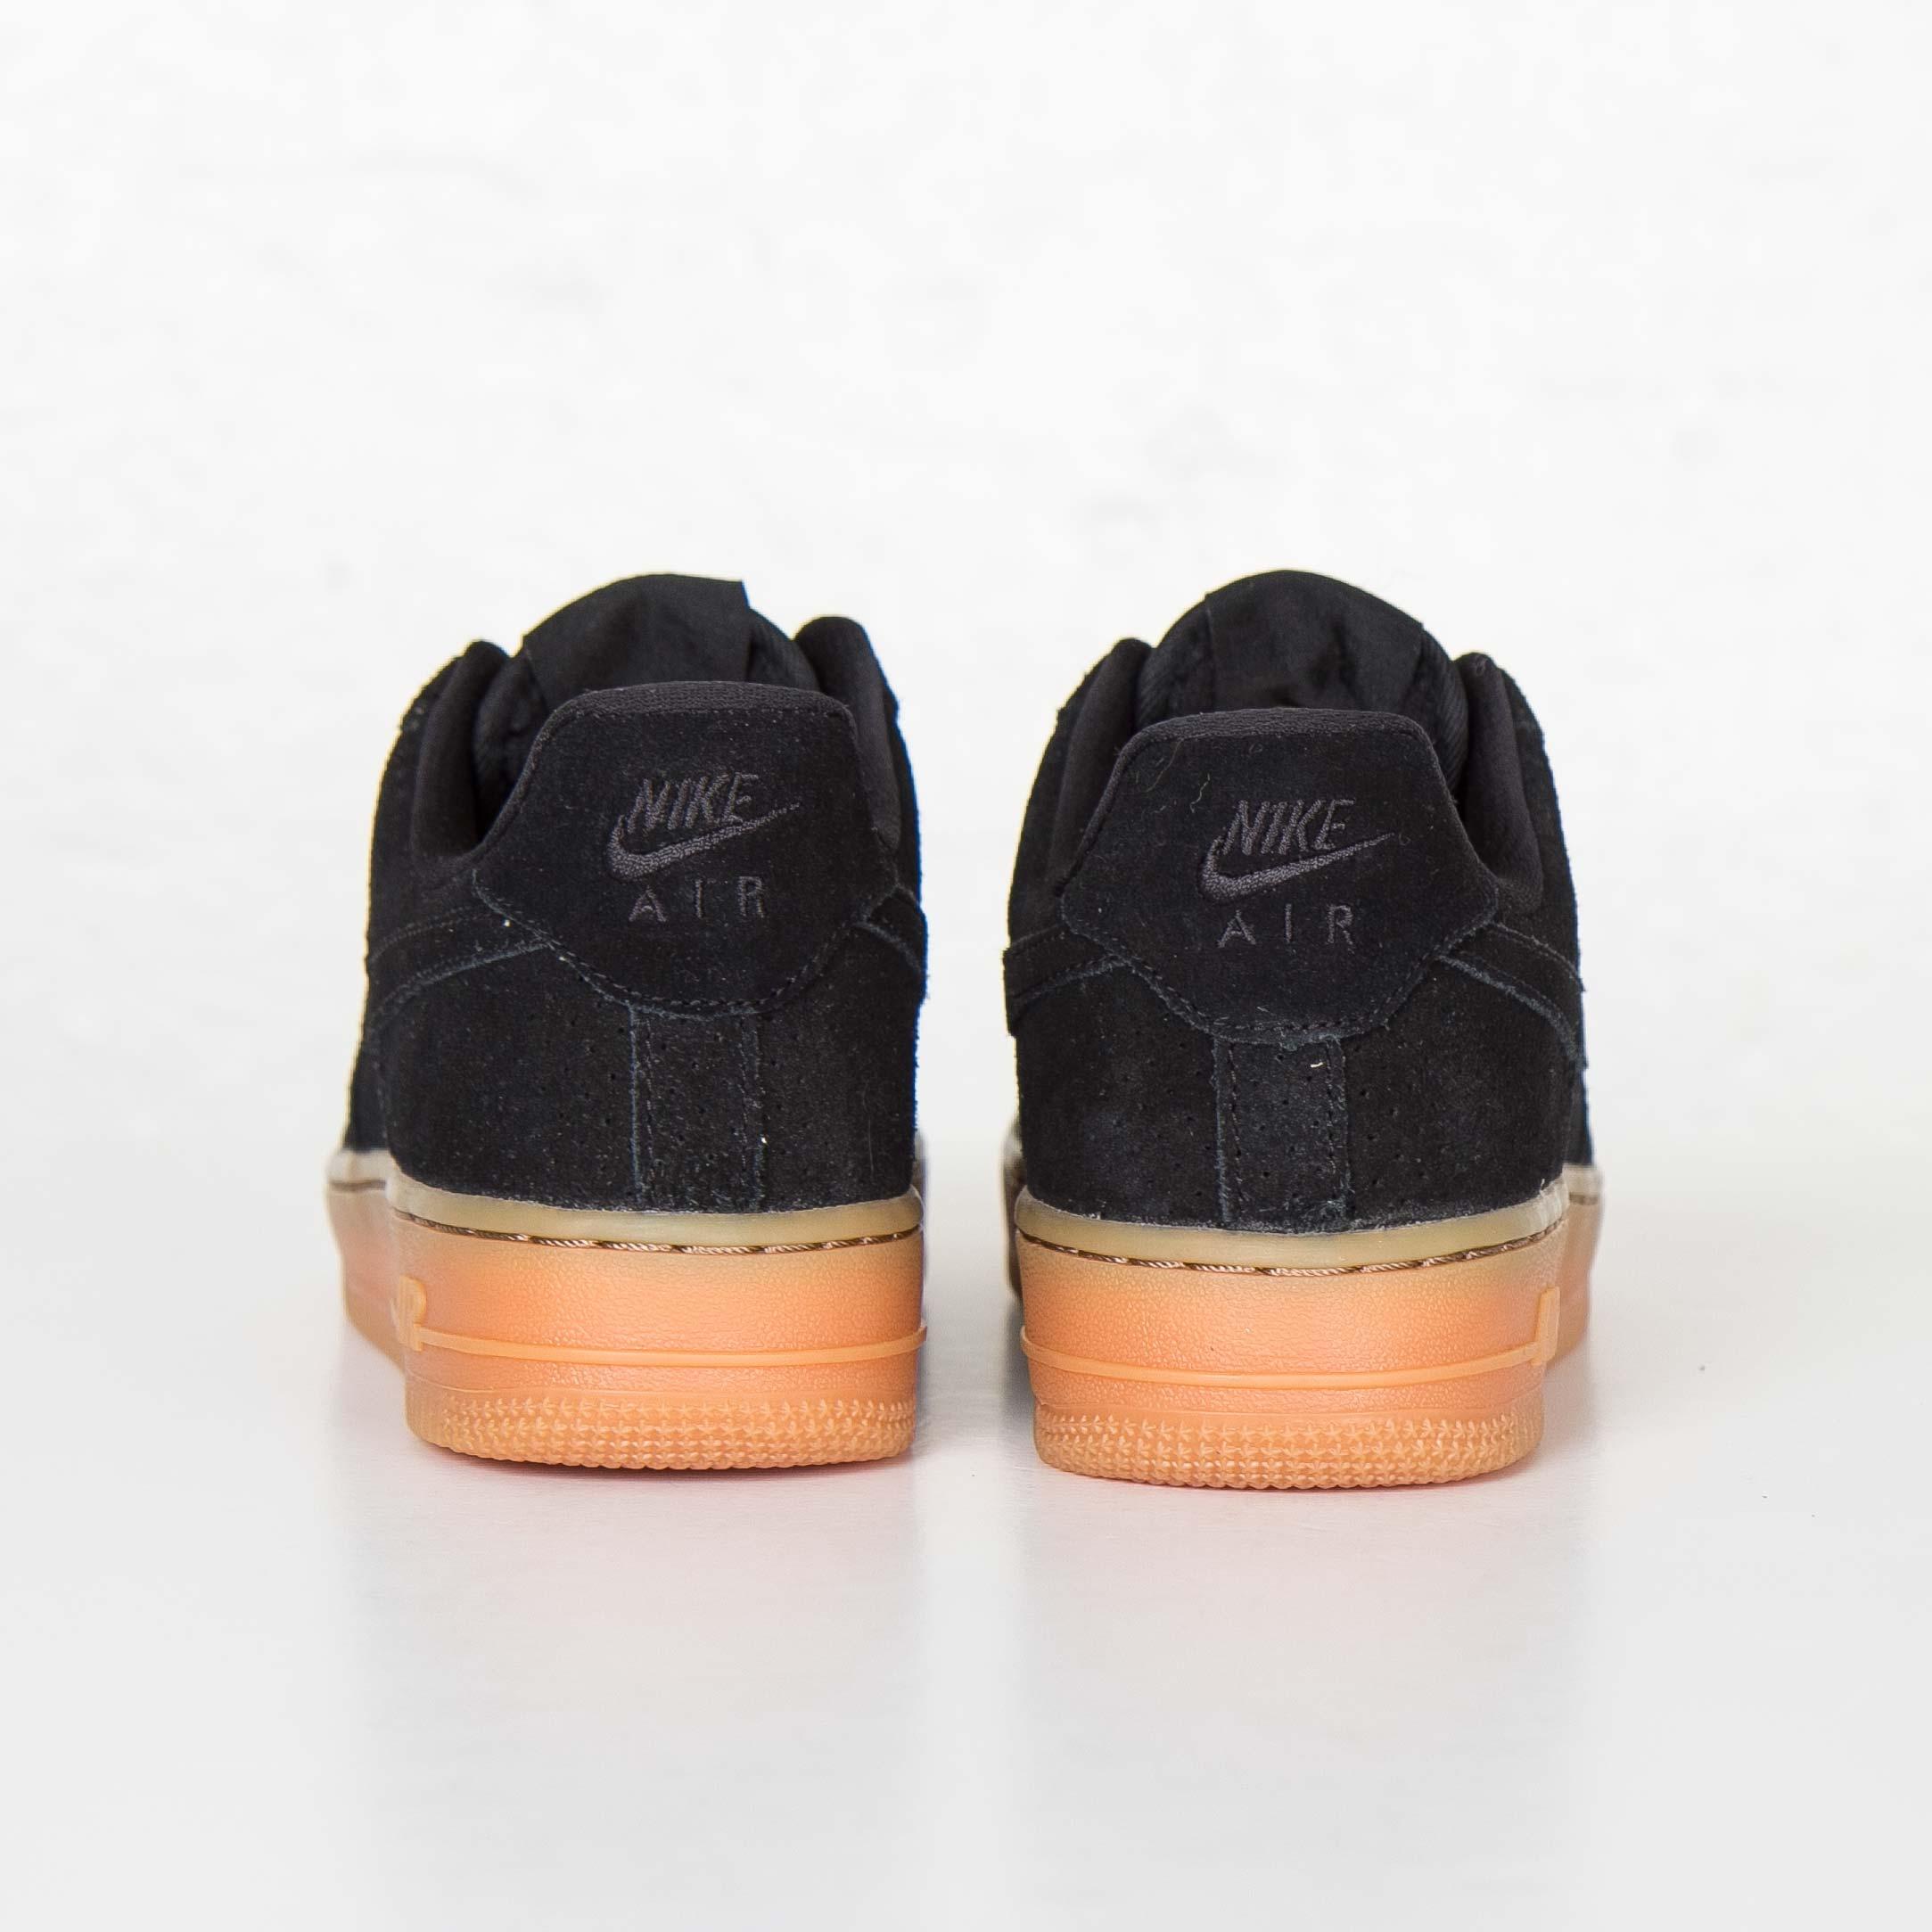 promo code 0bd72 76165 Nike Wmns Air Force 1 07 Suede - 749263-002 - Sneakersnstuff   sneakers    streetwear online since 1999